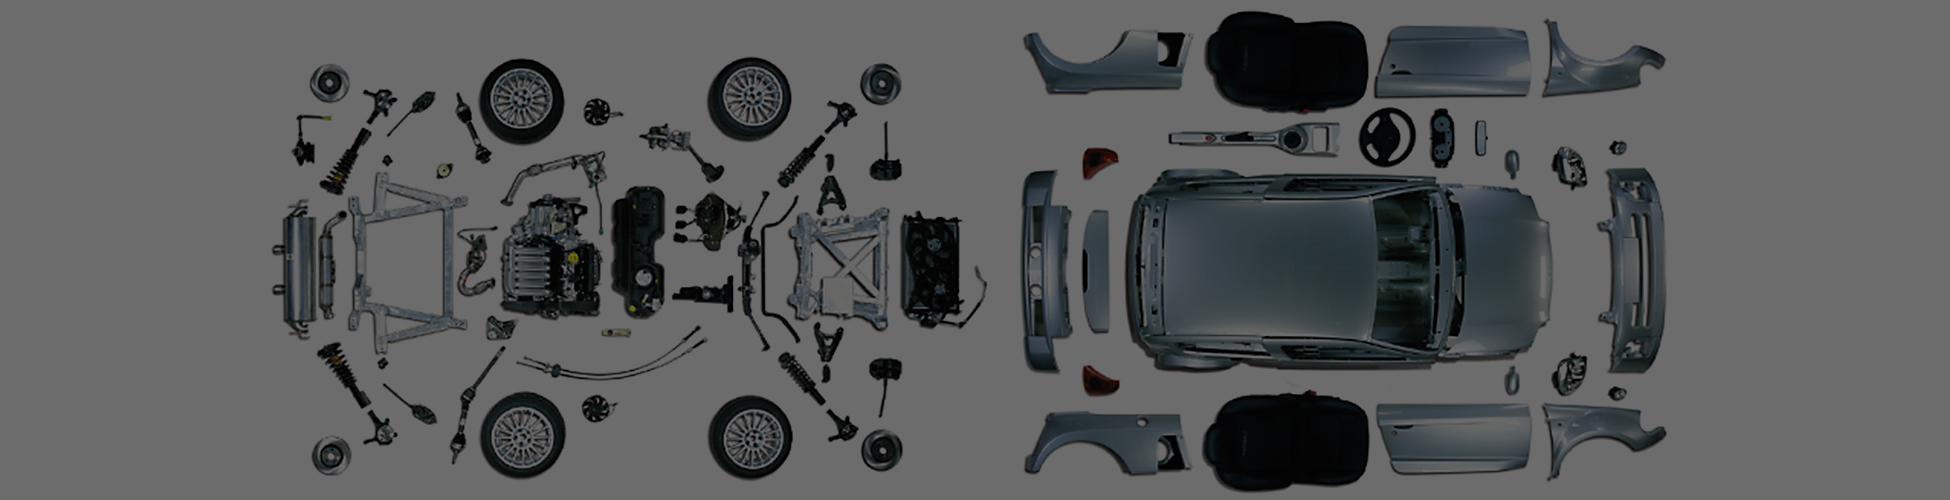 S3-Pieces-auto-et-carrosserie-neuf-val-europe-seine-marne-chanteloup-77